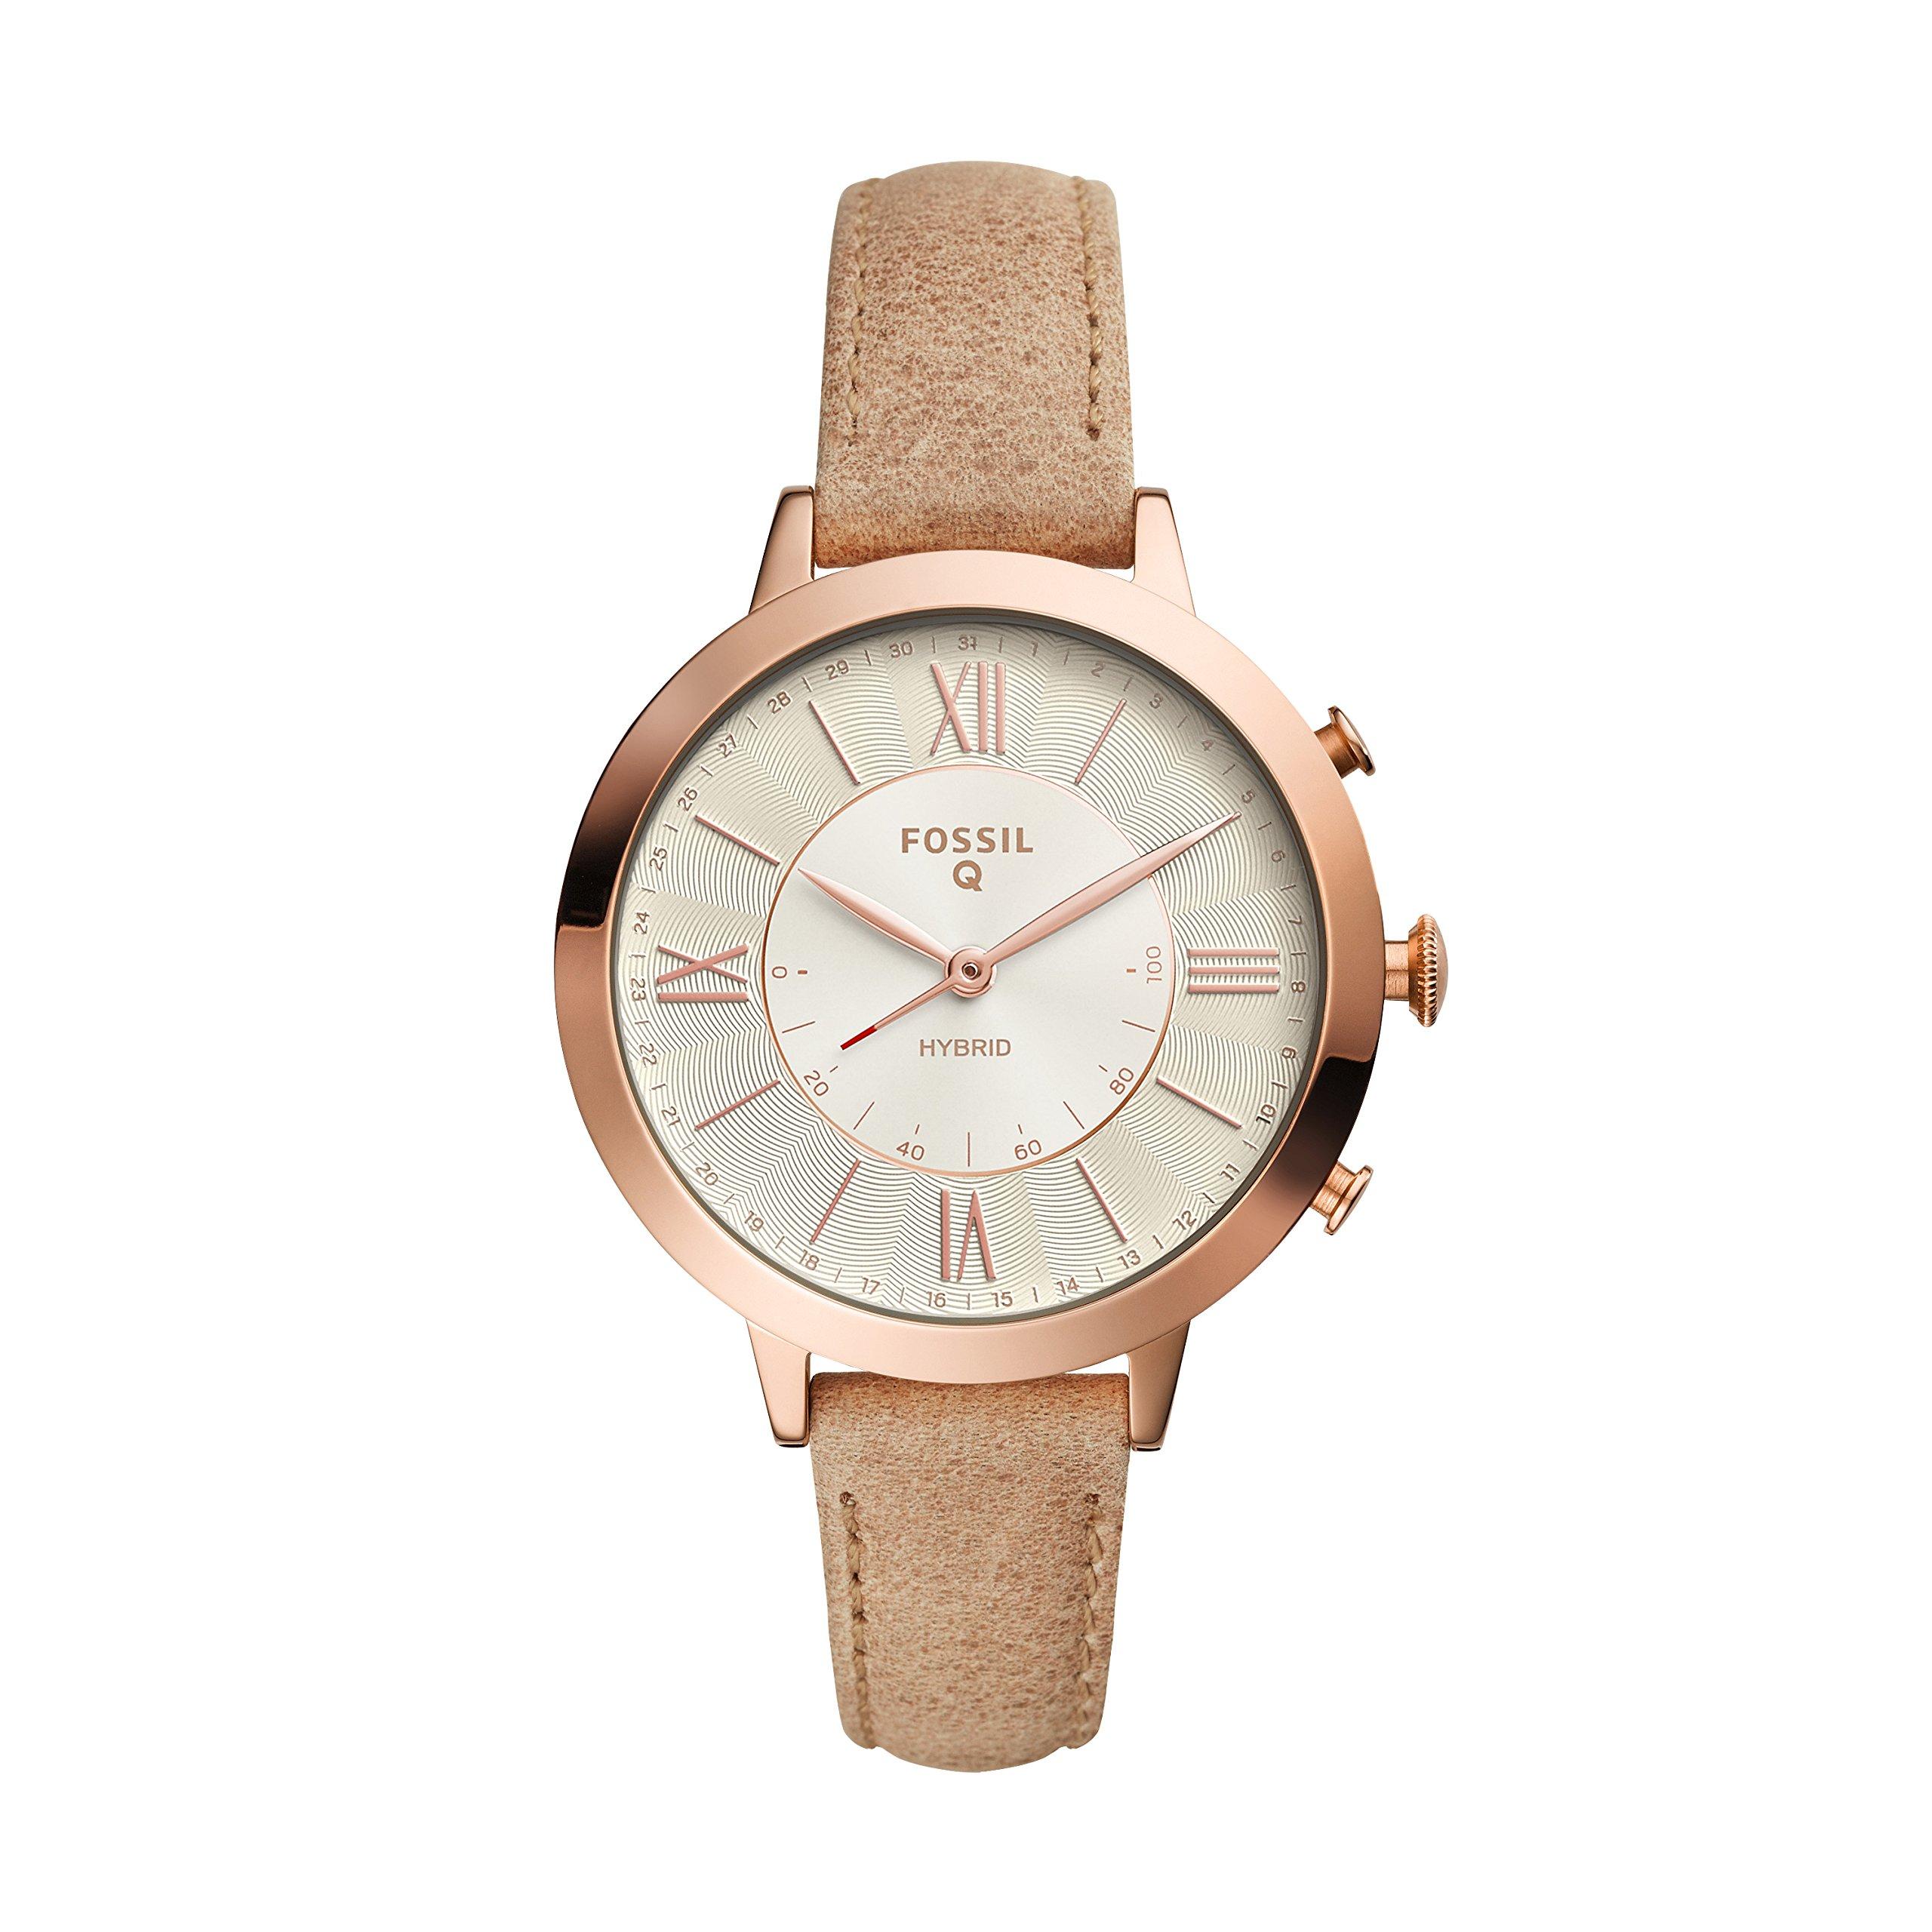 Fossil Hybrid Smartwatch - Q Jacqueline Bone Leather FTW5013